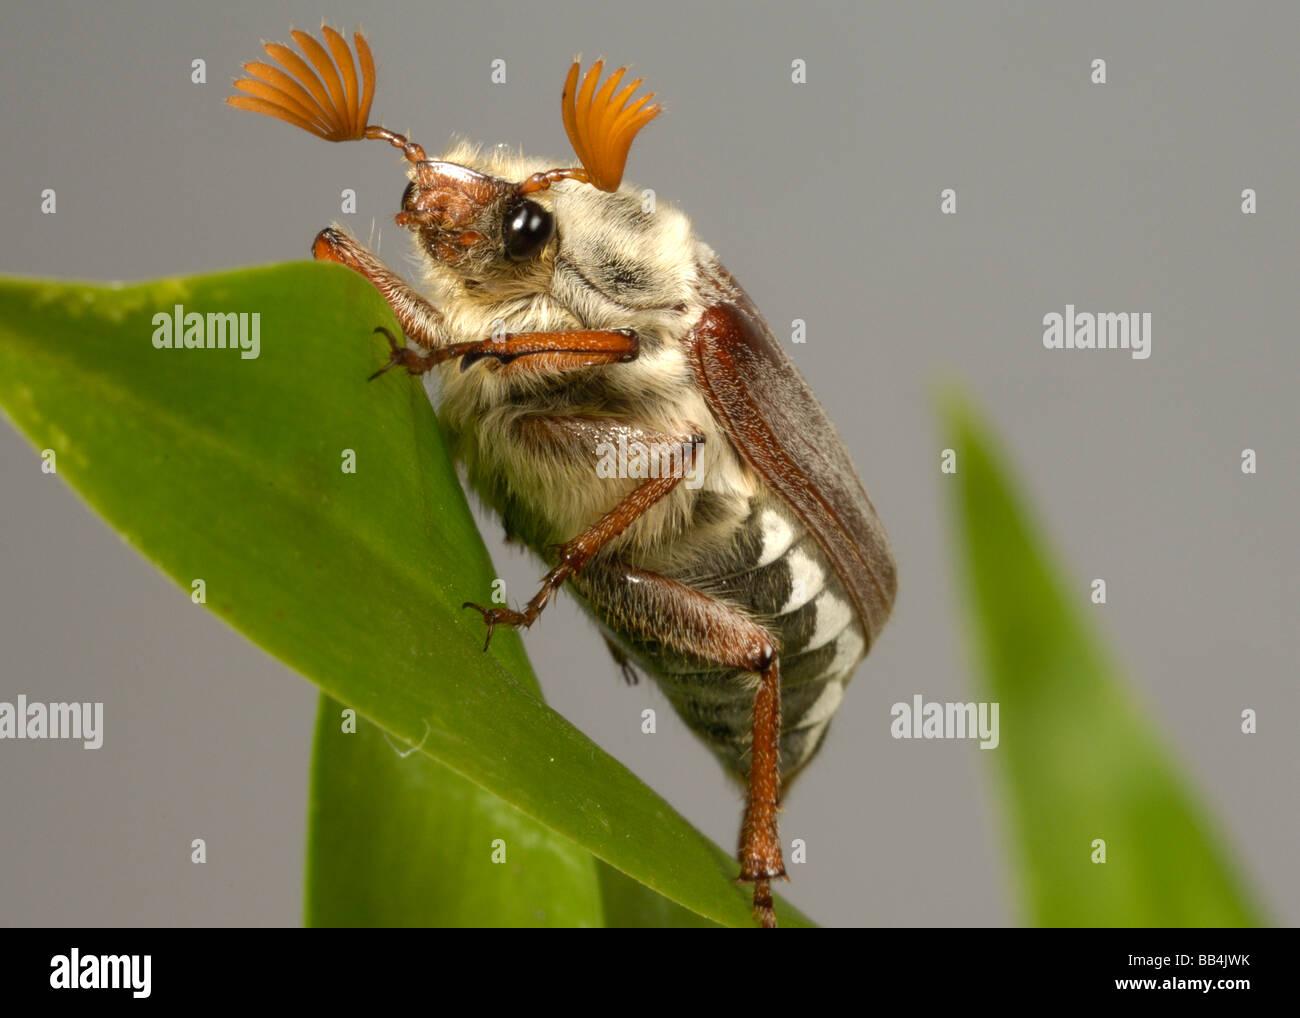 Melolontha melolontha cockchafer adultos o bug en una hoja Foto de stock